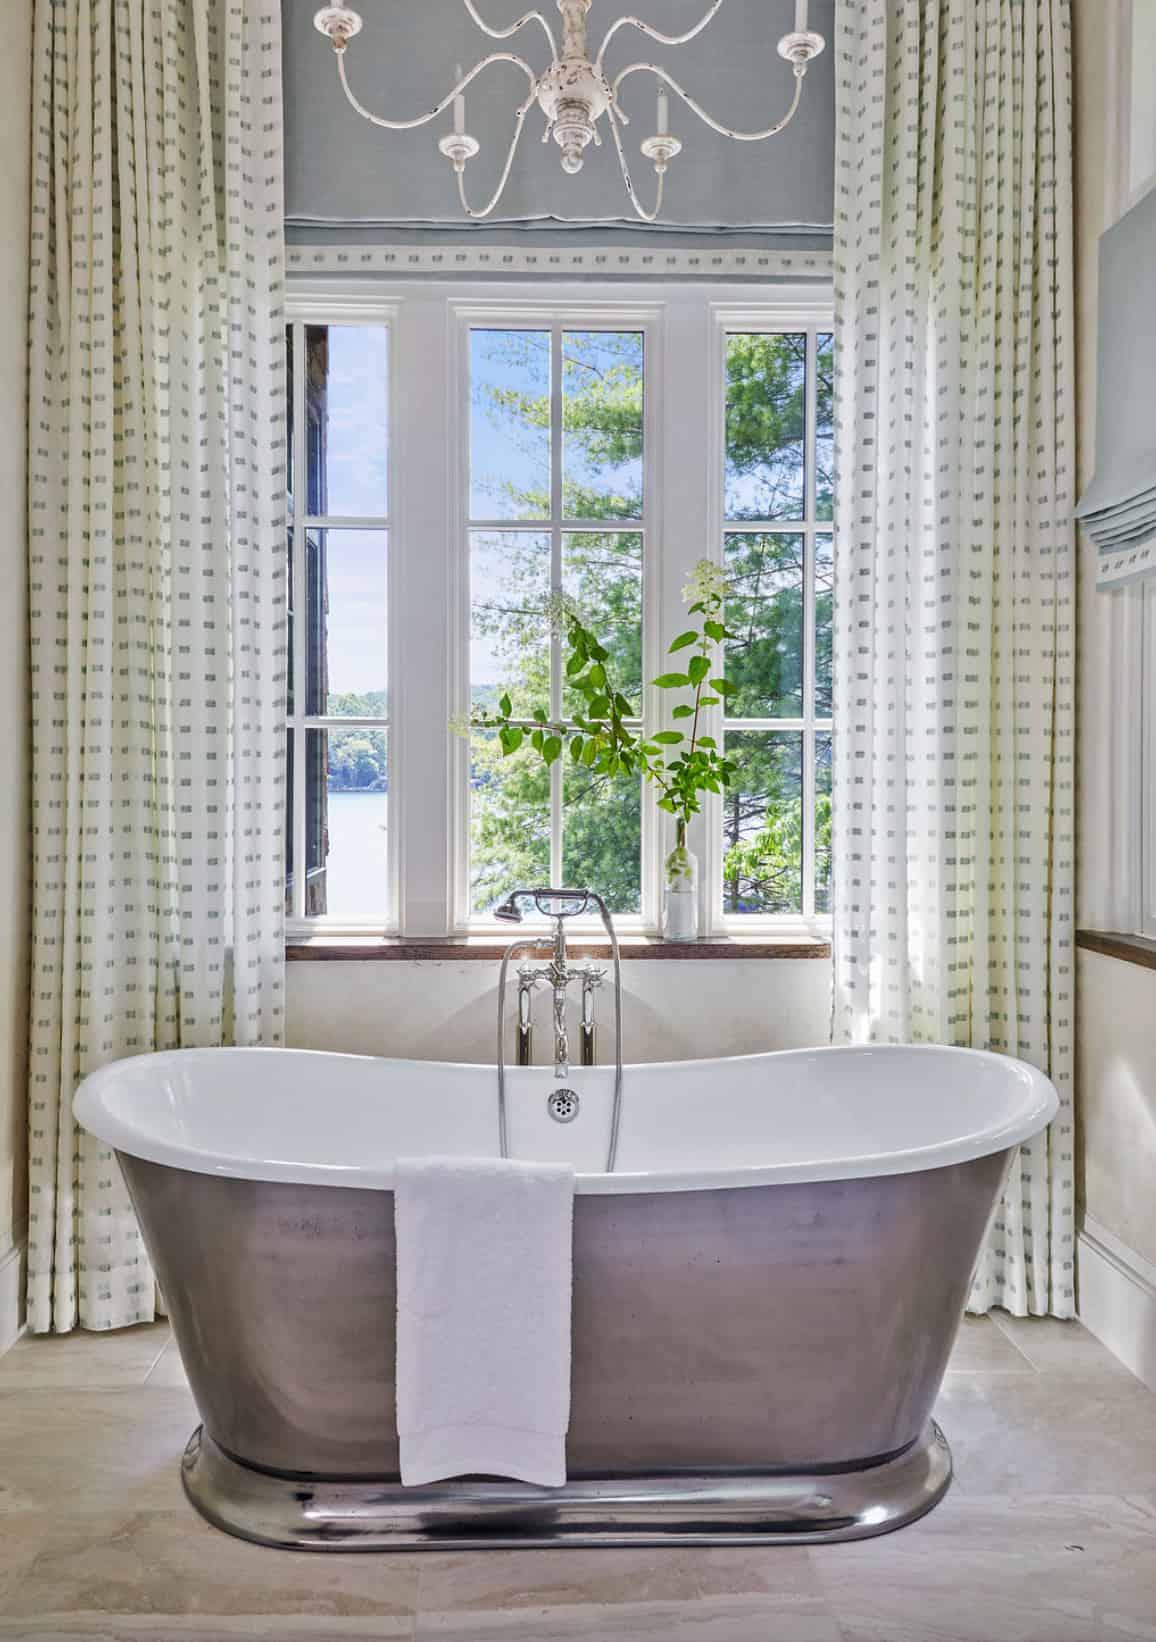 baño-transicional-independiente-bañera